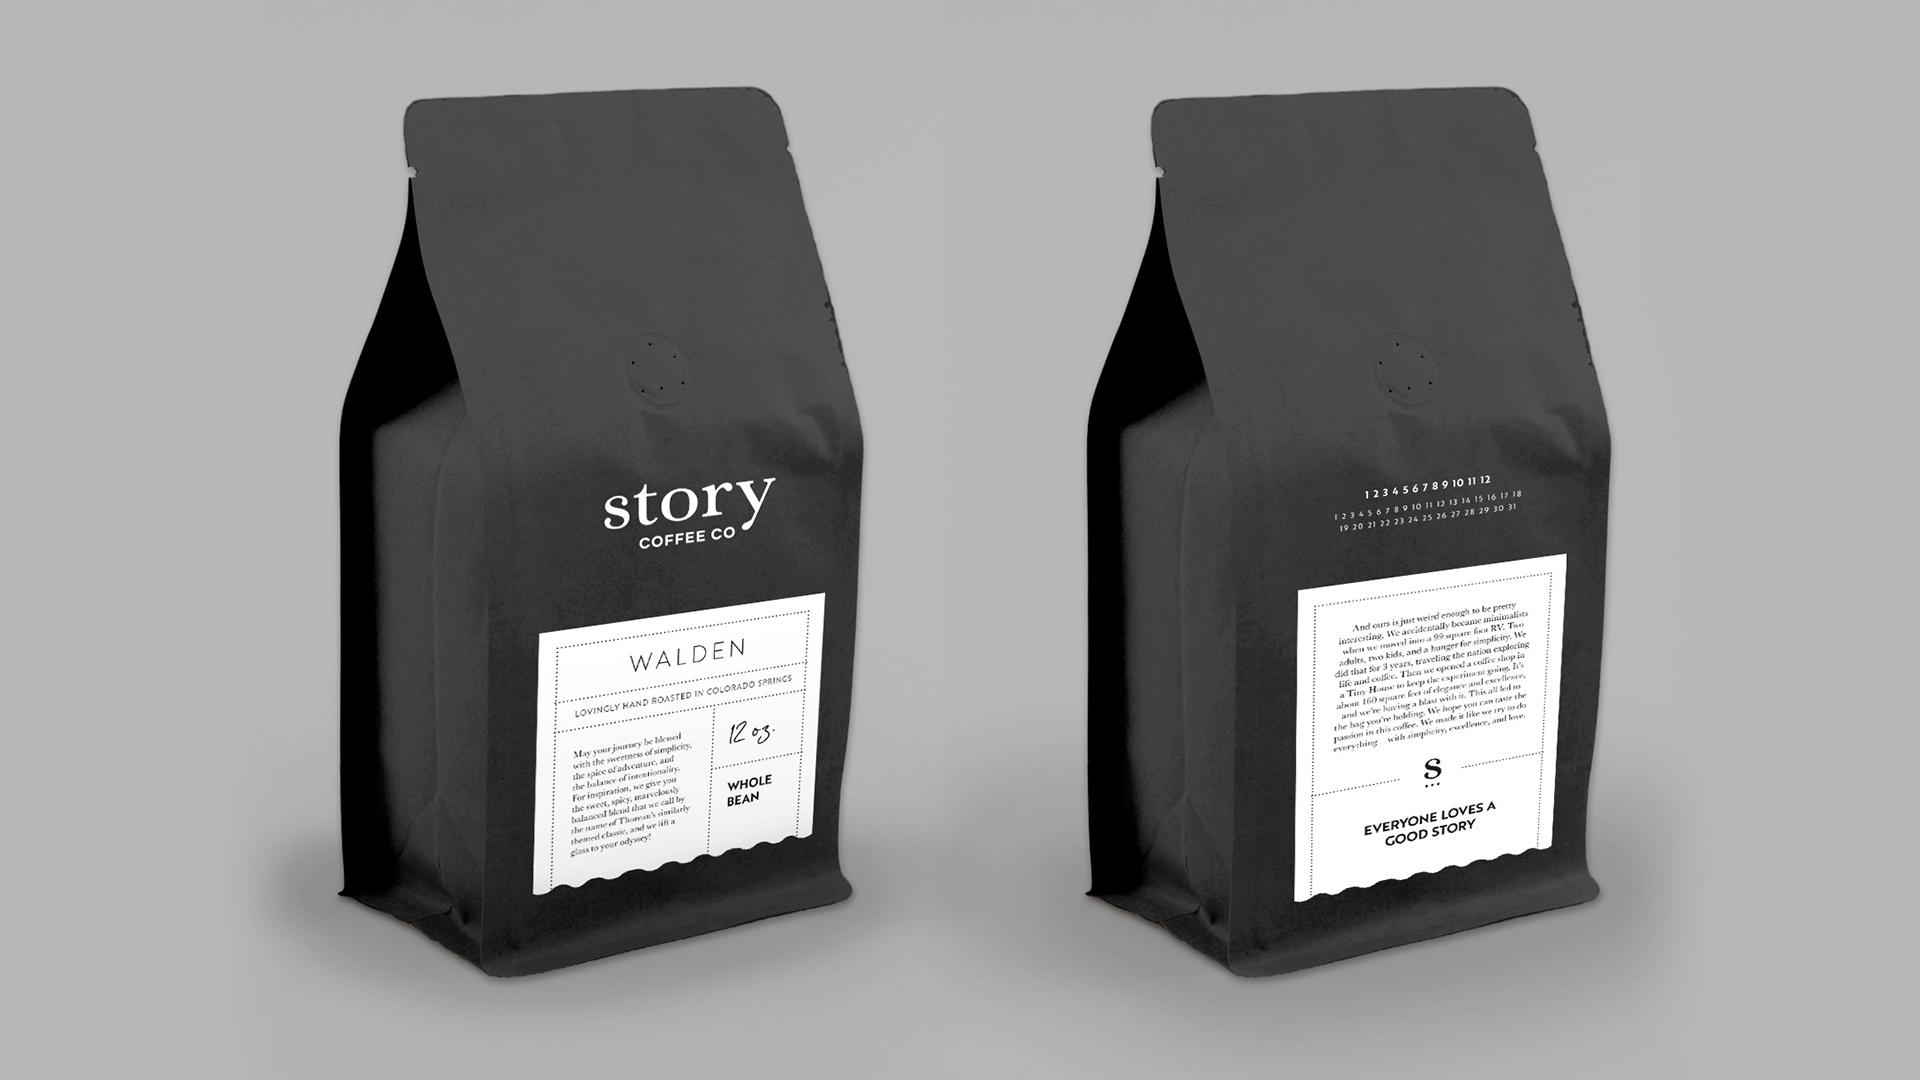 story-coffee-co-casestudy-8.jpg